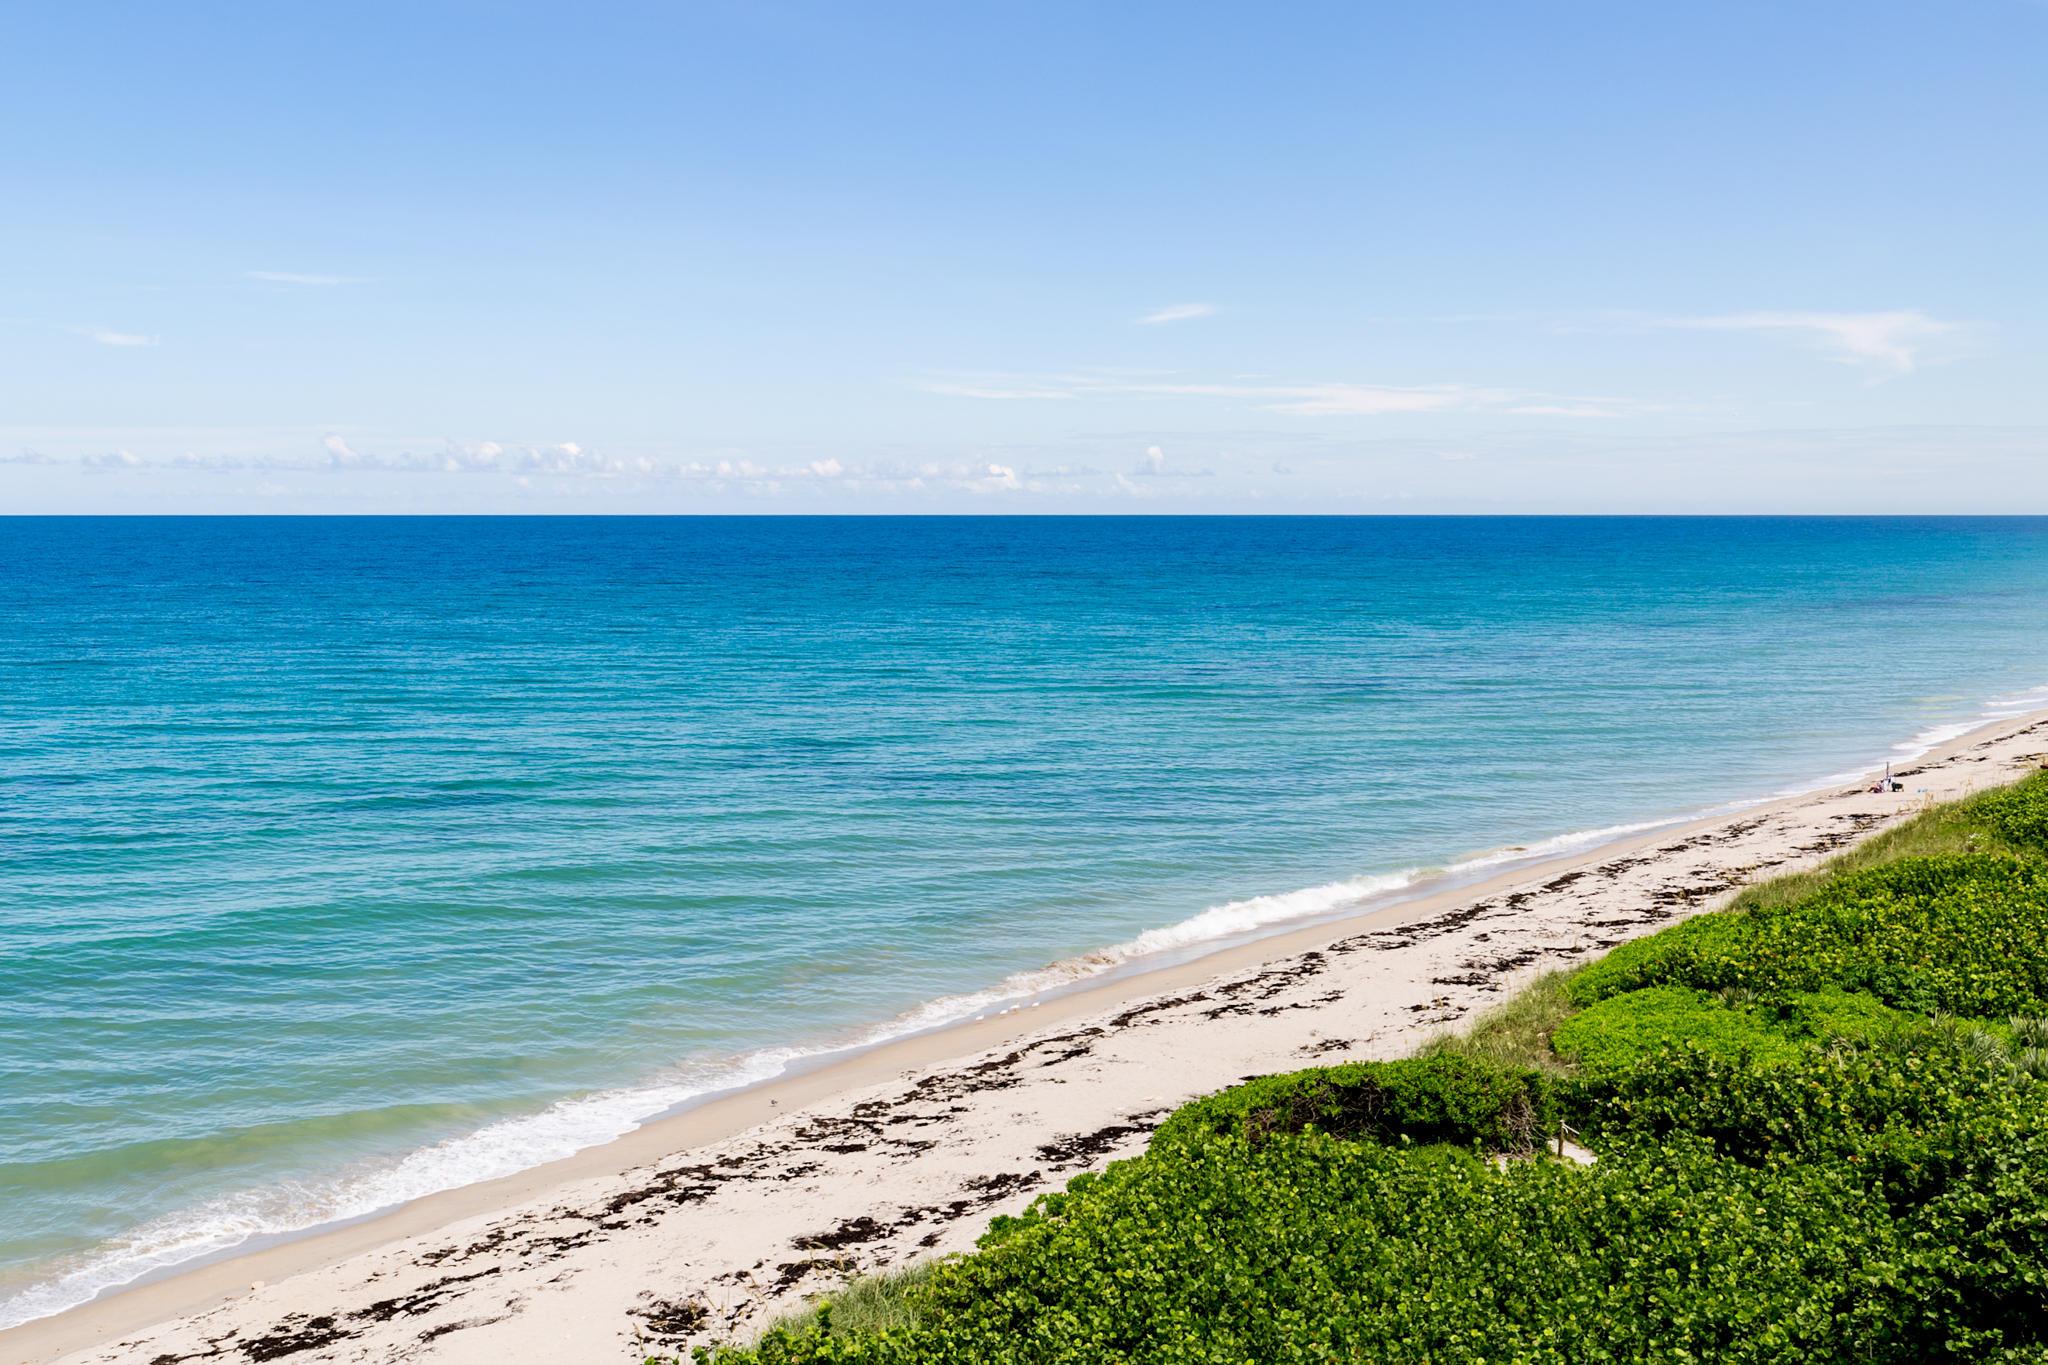 Ocean S Jensen Beach 34957